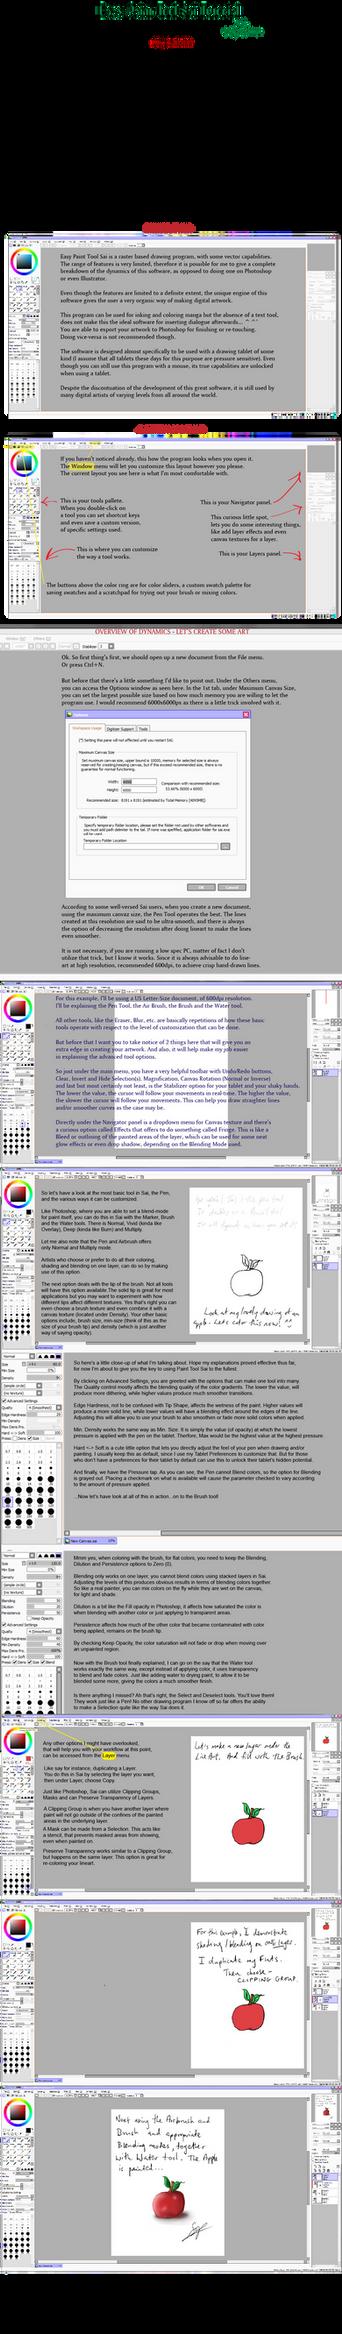 Easy Paint Sai Tutorial - Part 1 :Draft: by Sop-sama